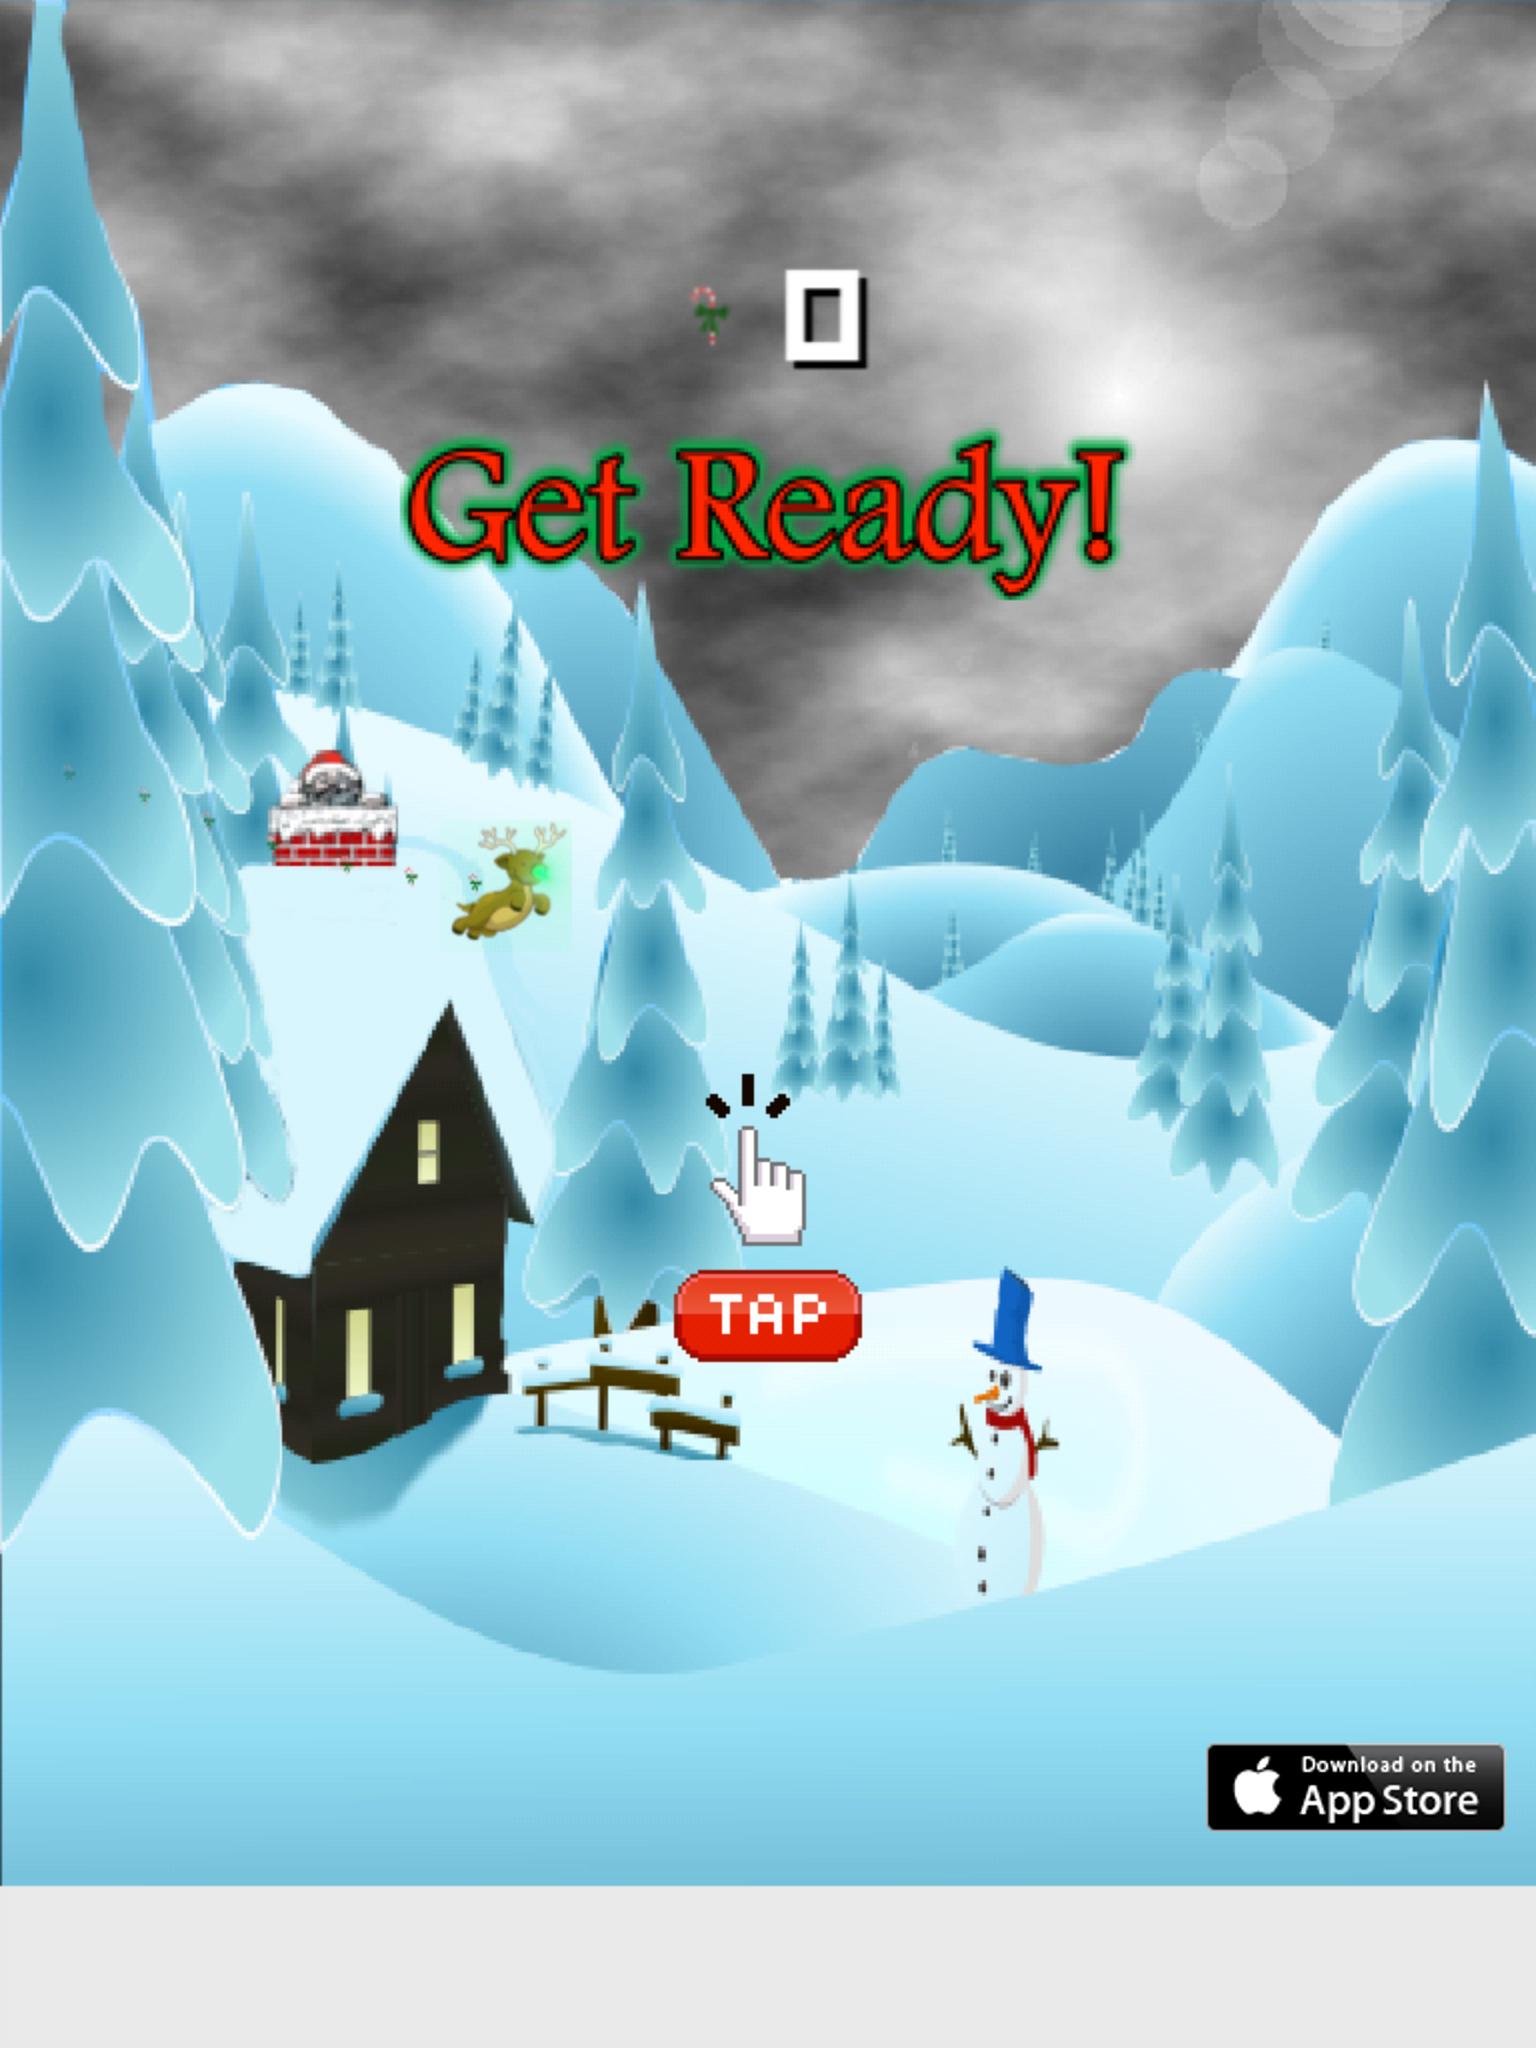 Rudy The Reindeer